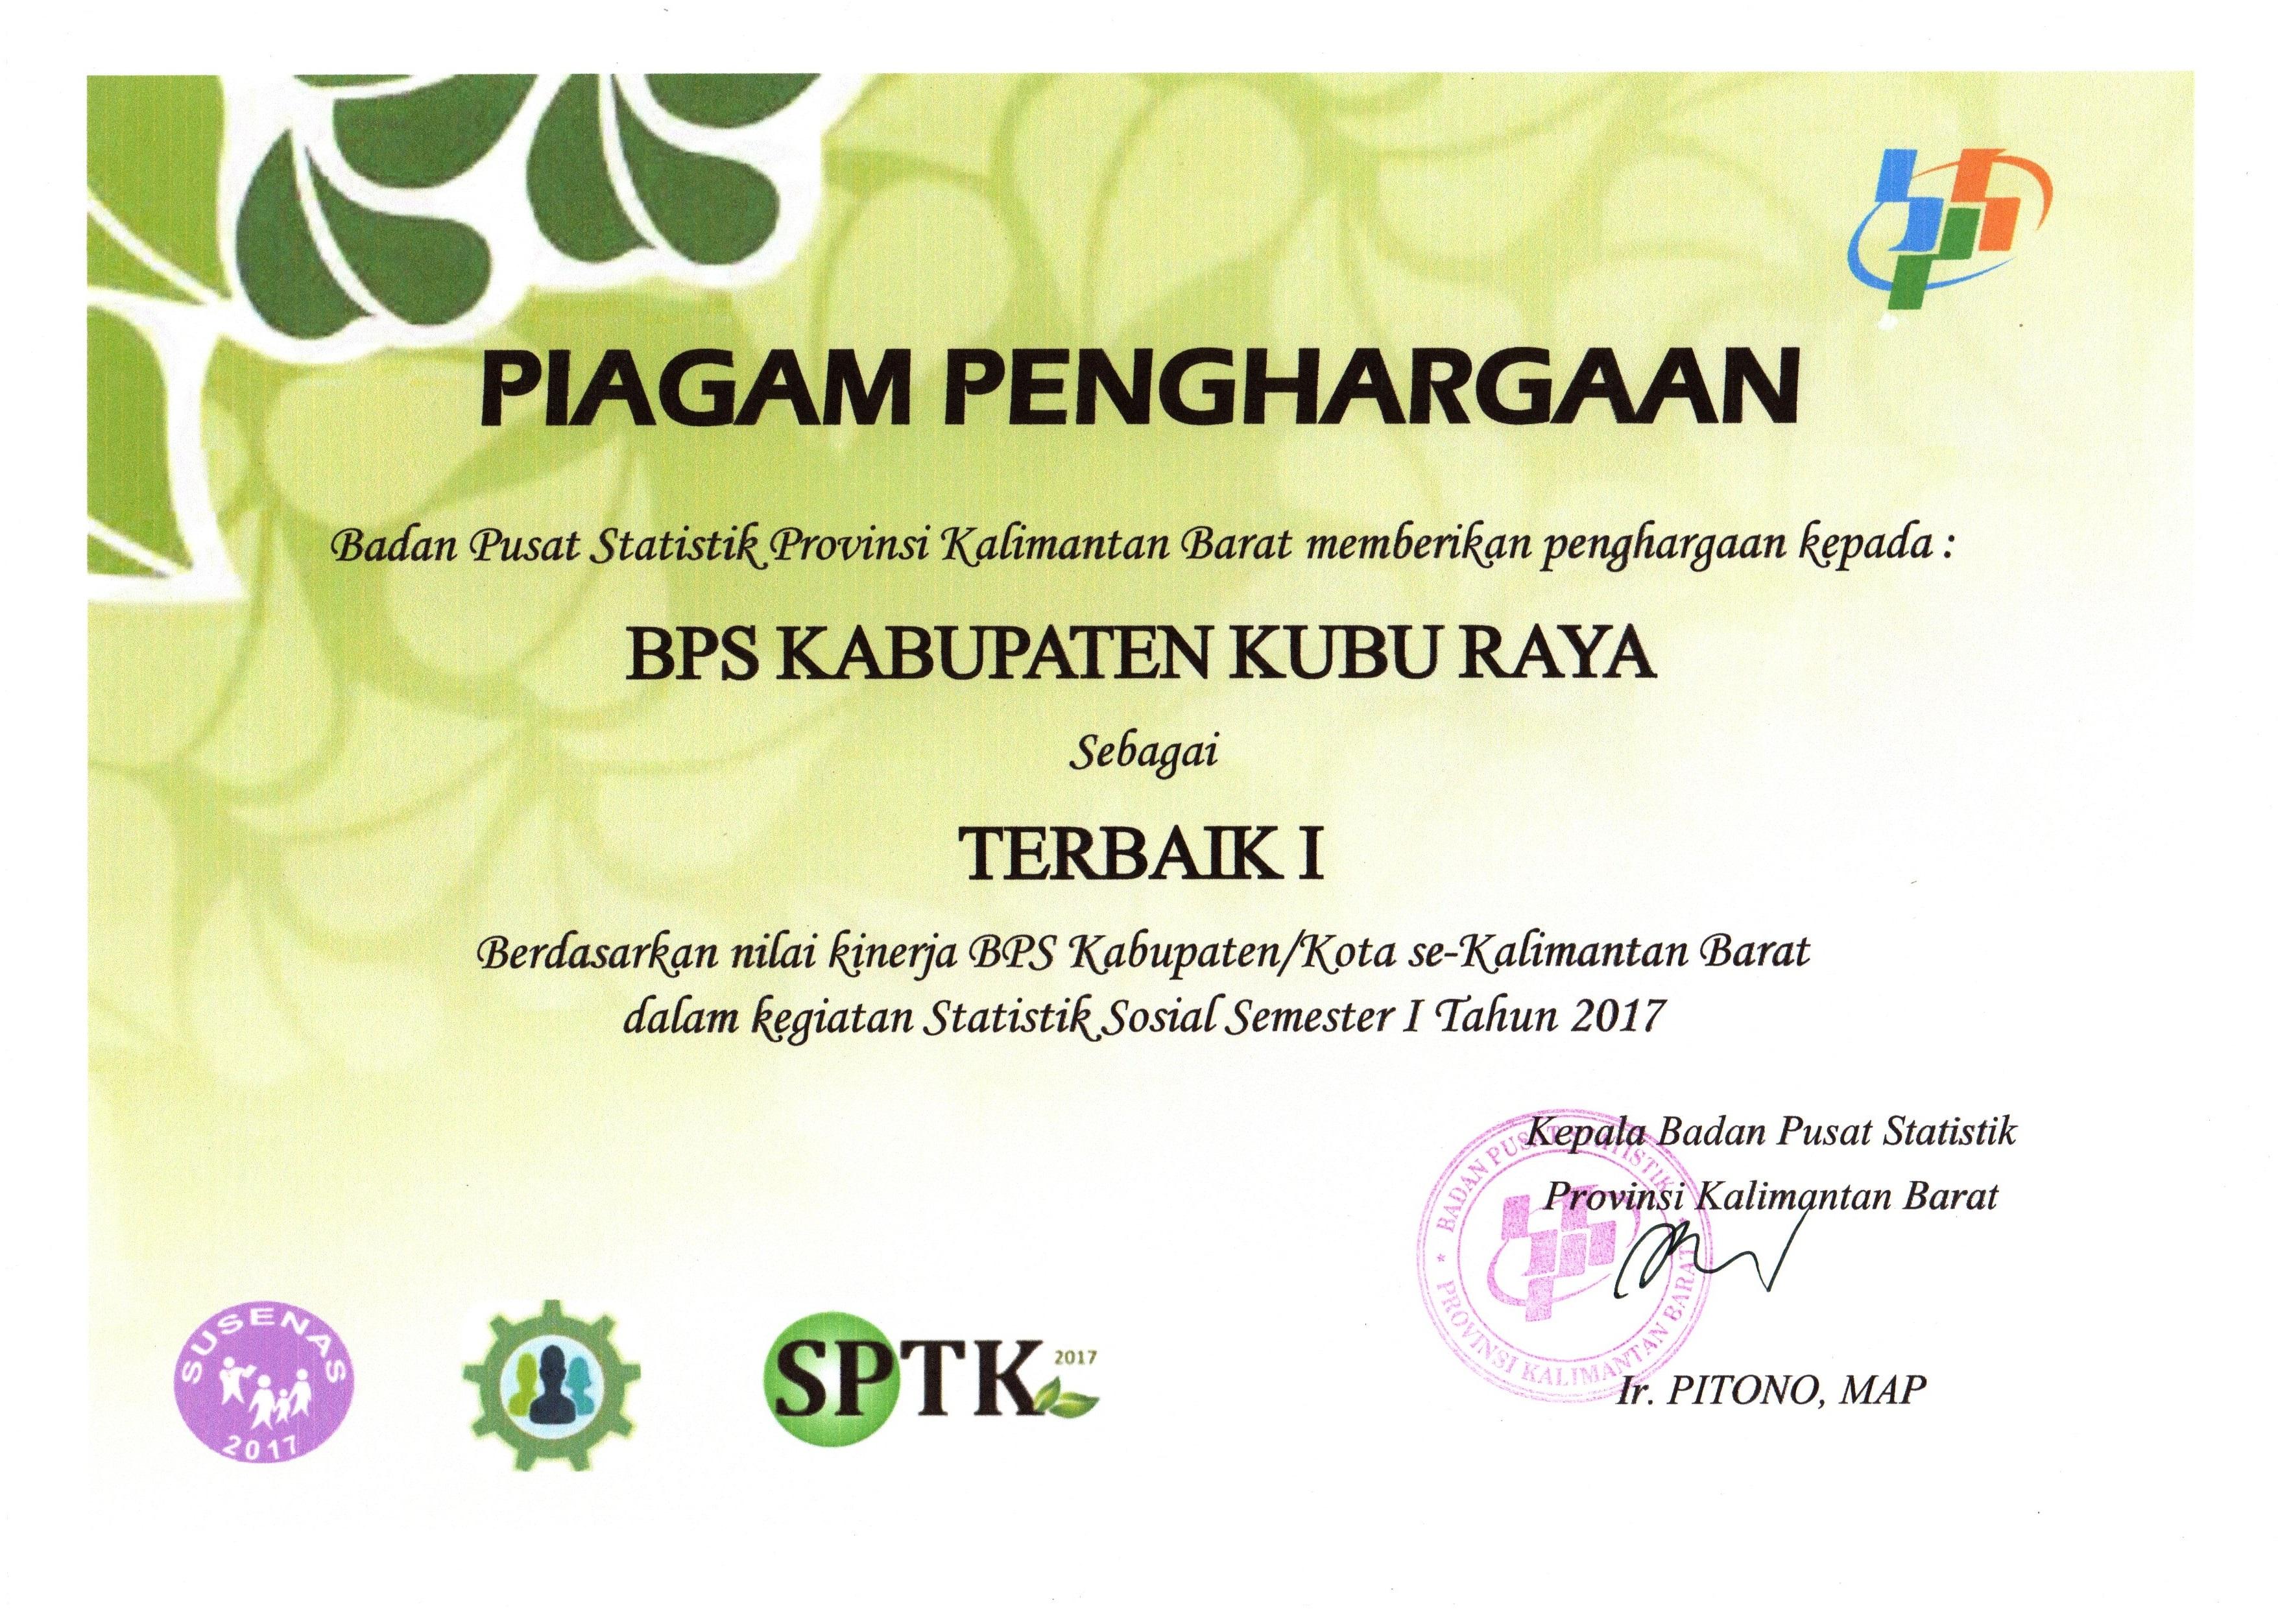 peringkat 1 kegiatan statistik sosial se-Kalimantan Barat